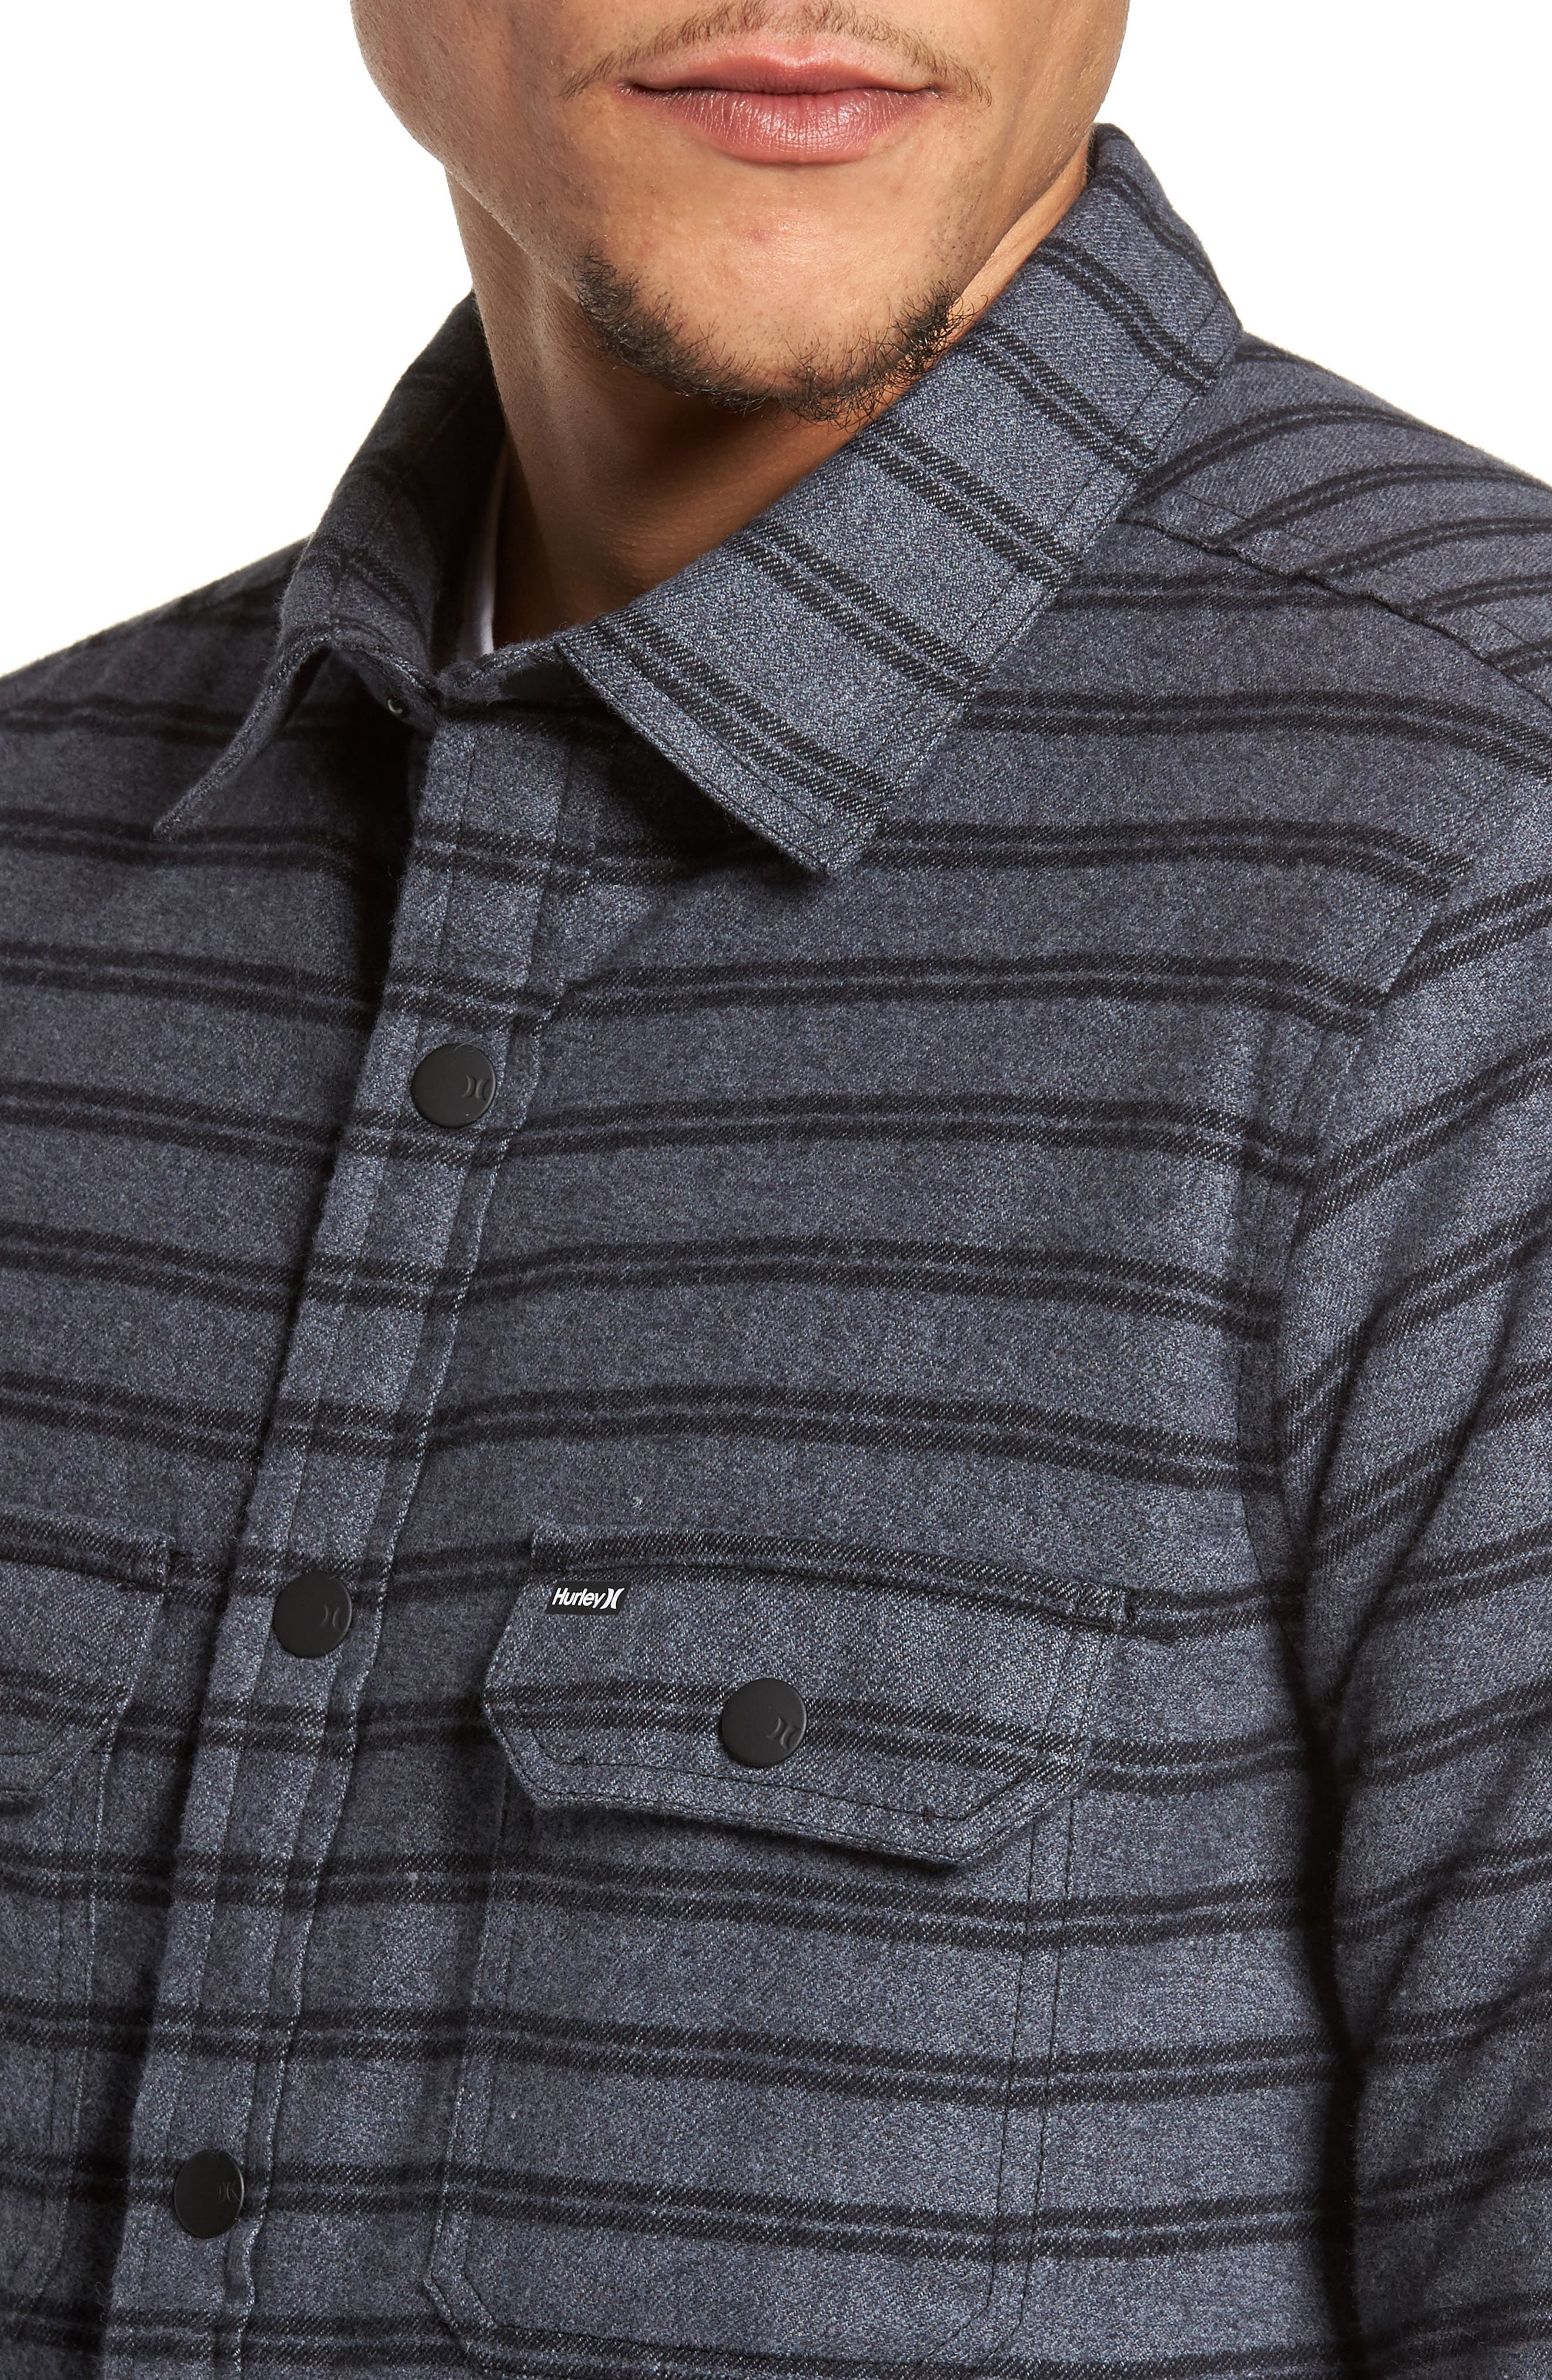 Dispatch Shirt Jacket,                             Alternate thumbnail 4, color,                             010